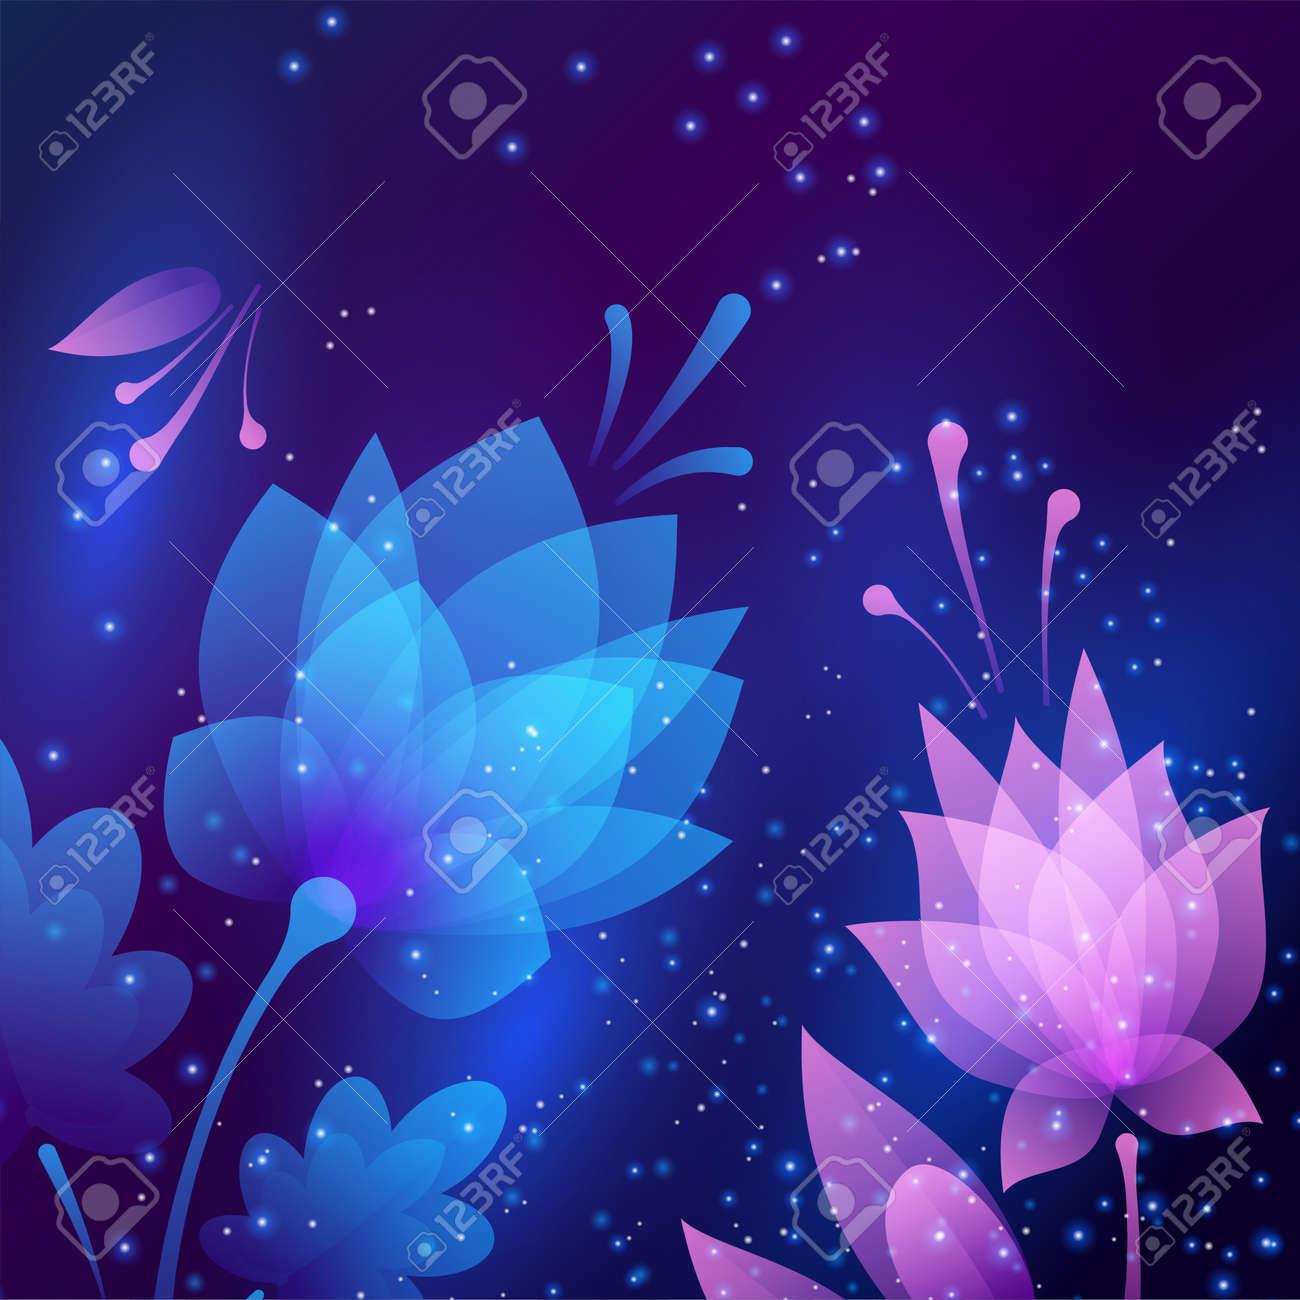 Beautiful futuristic night flowers abstract card illustration beautiful futuristic night flowers abstract card illustration stock illustration 98992933 izmirmasajfo